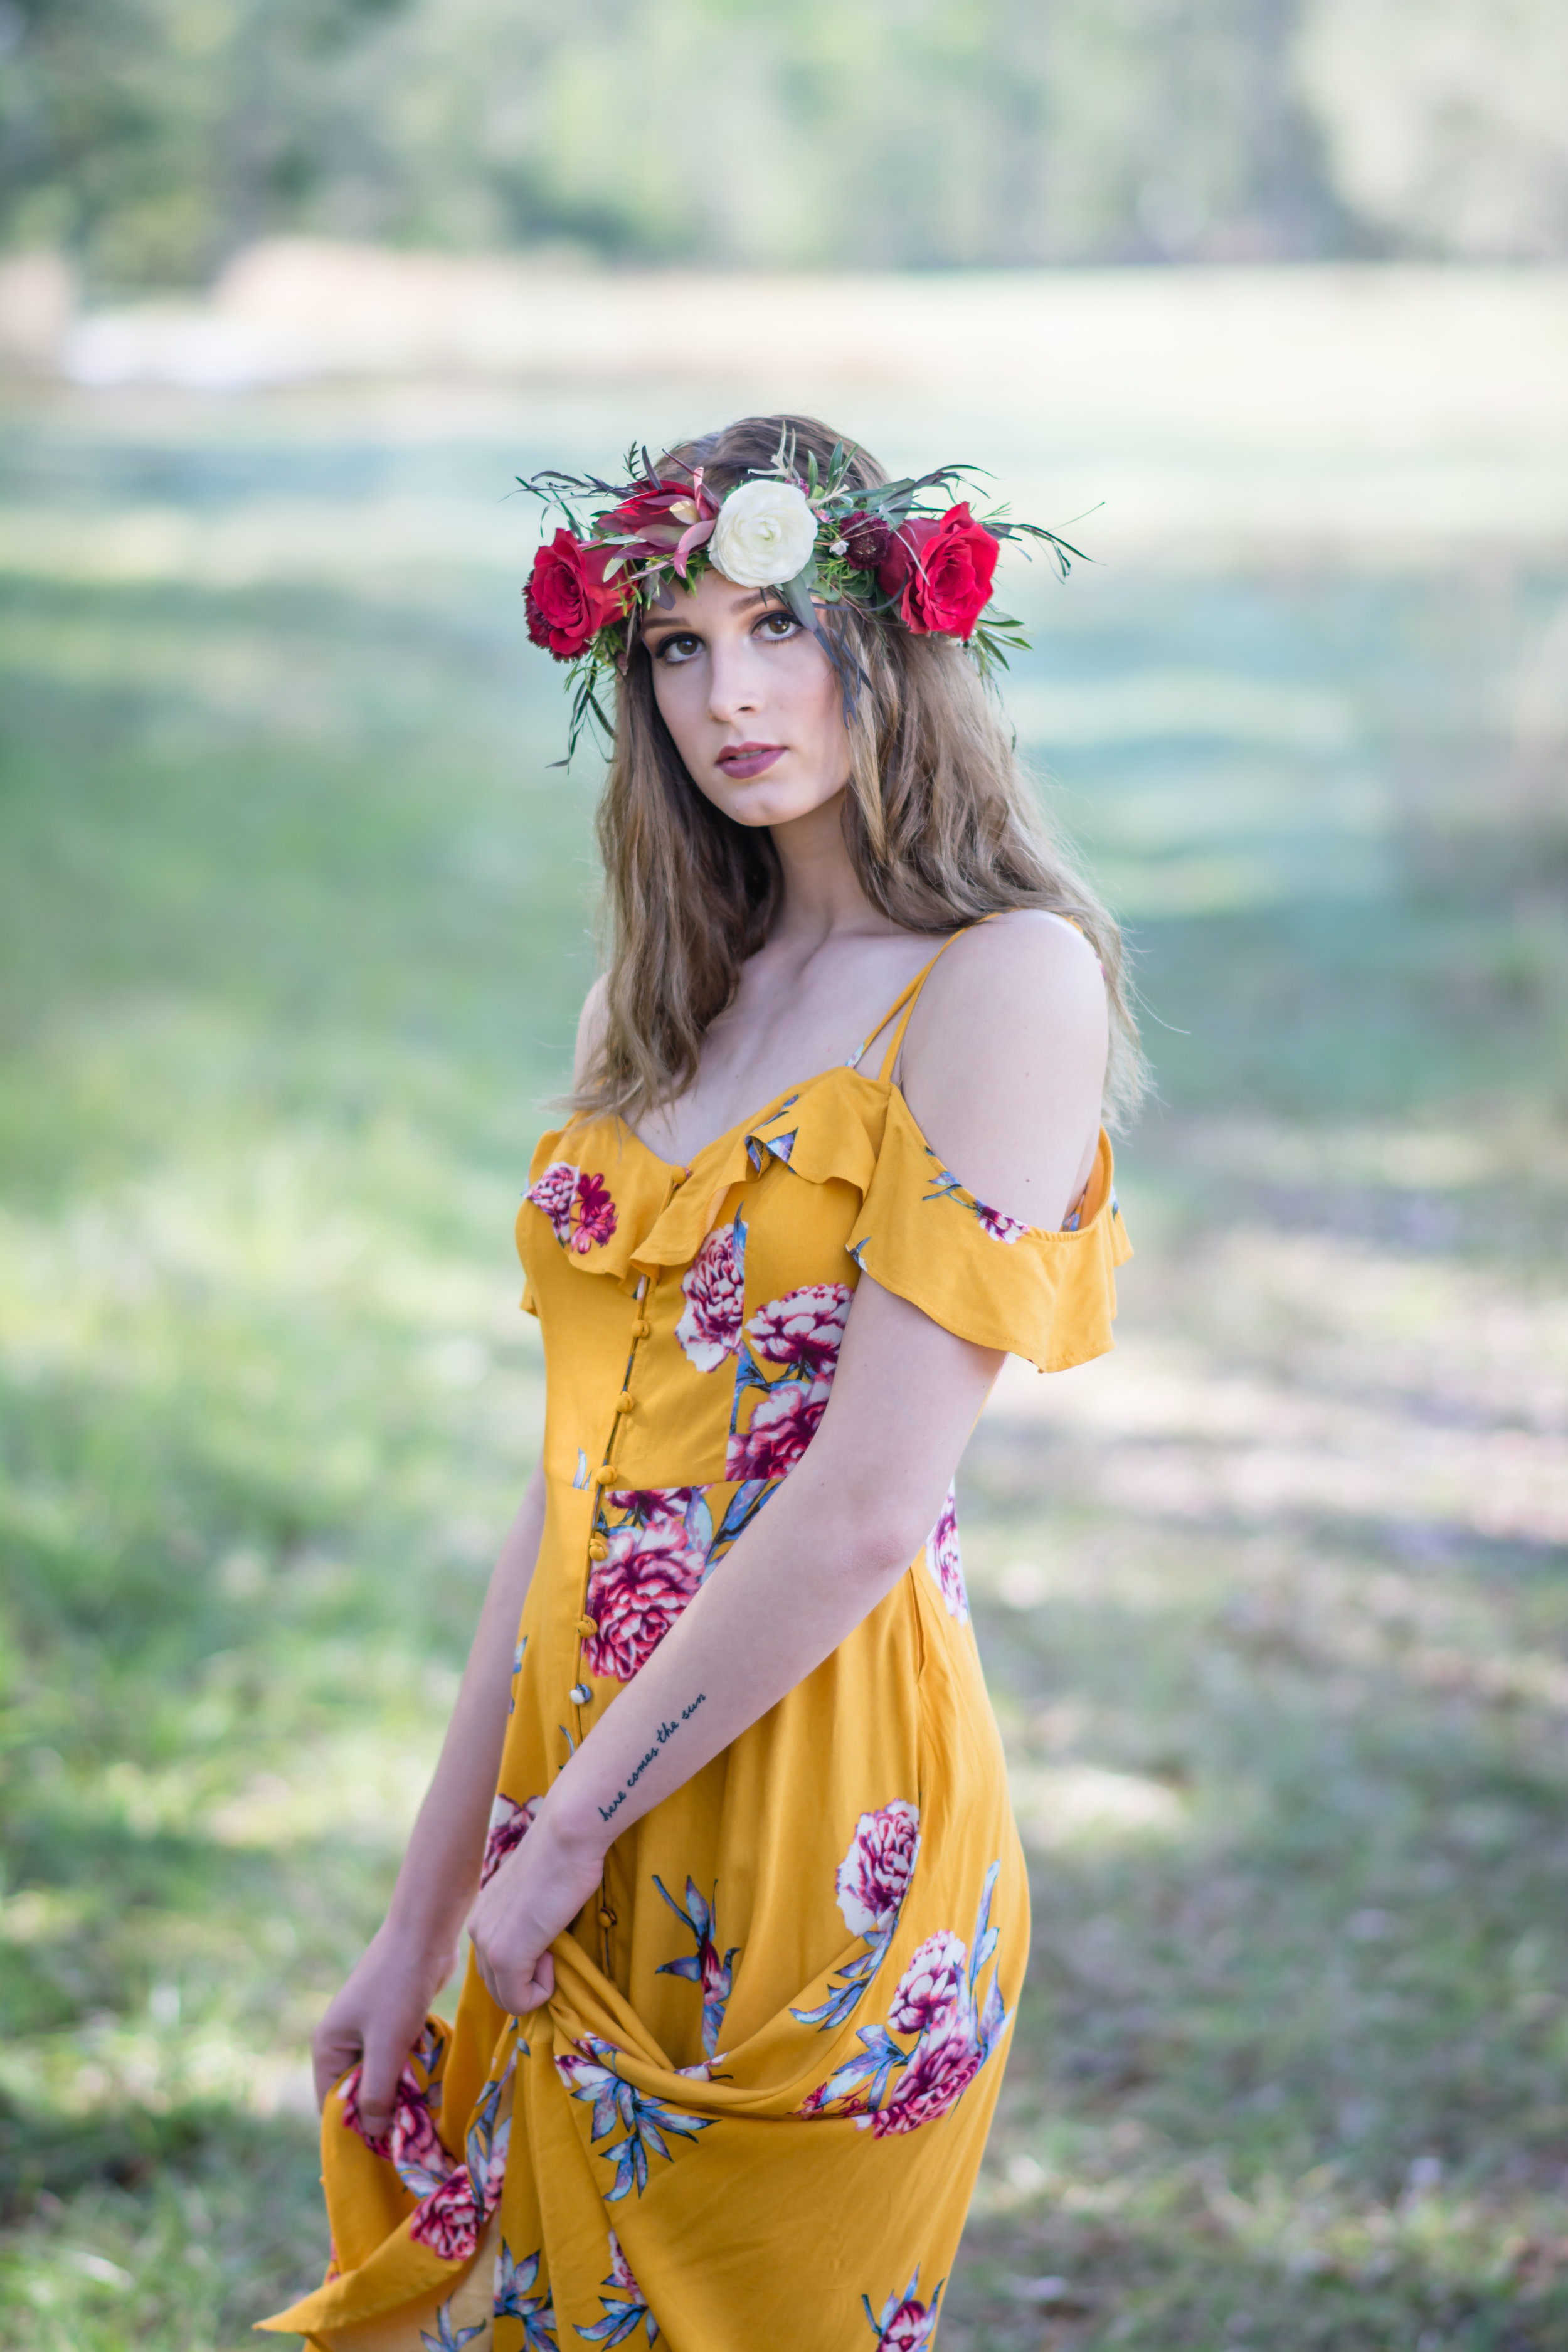 floral-headpiece-fashion-photoshoot-geneva-central-florida-photographer-yanitza-ninett-20.jpg